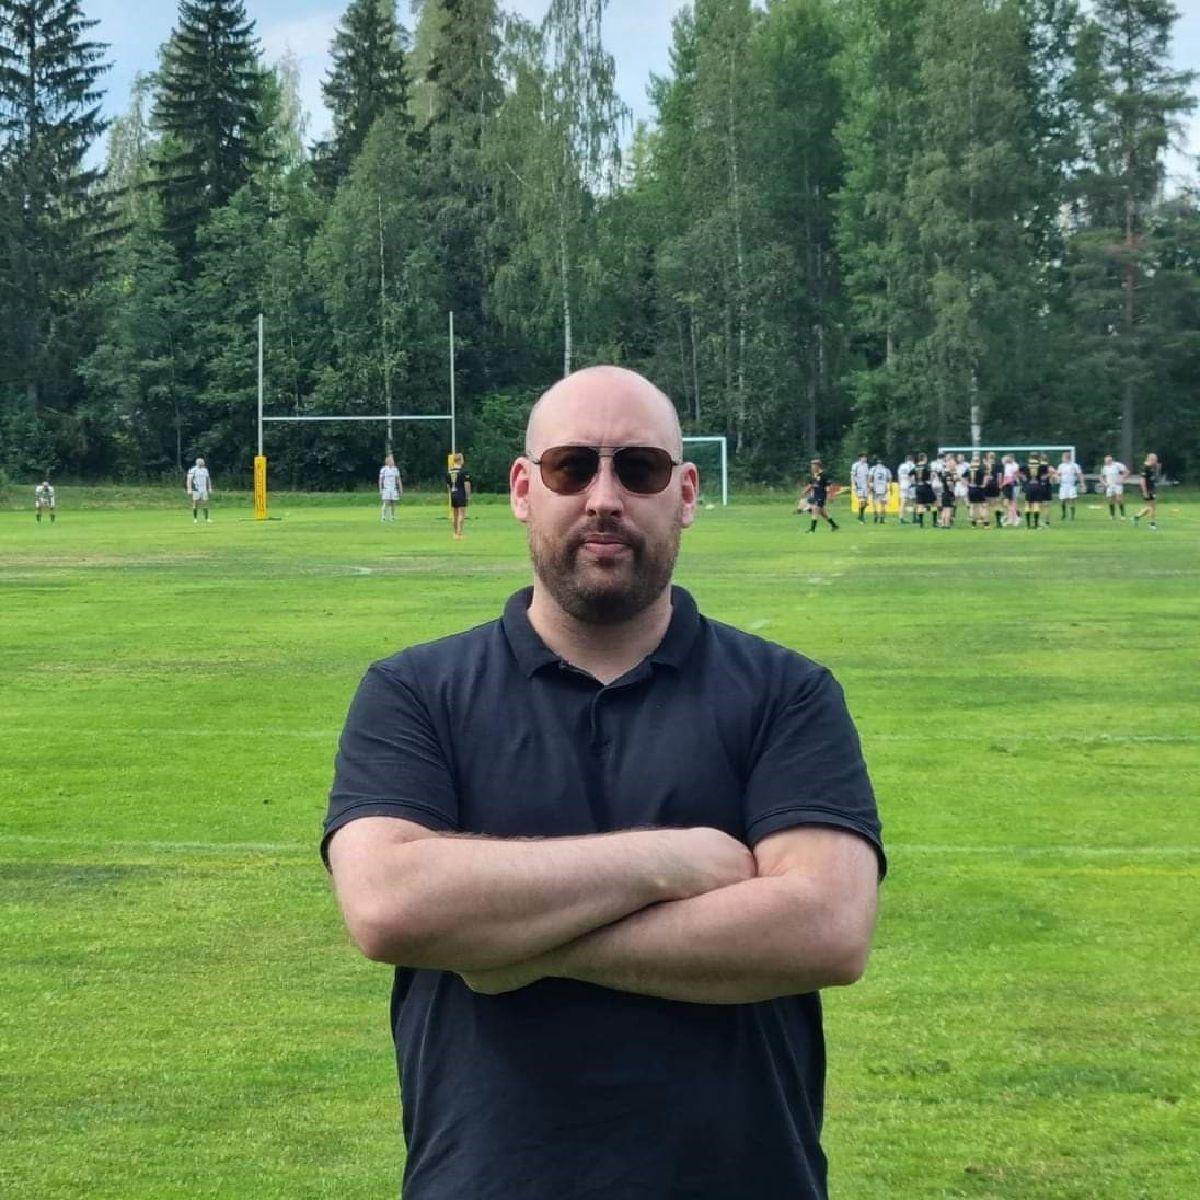 Suomen rugbyliitto sai uuden rahastohoitajan